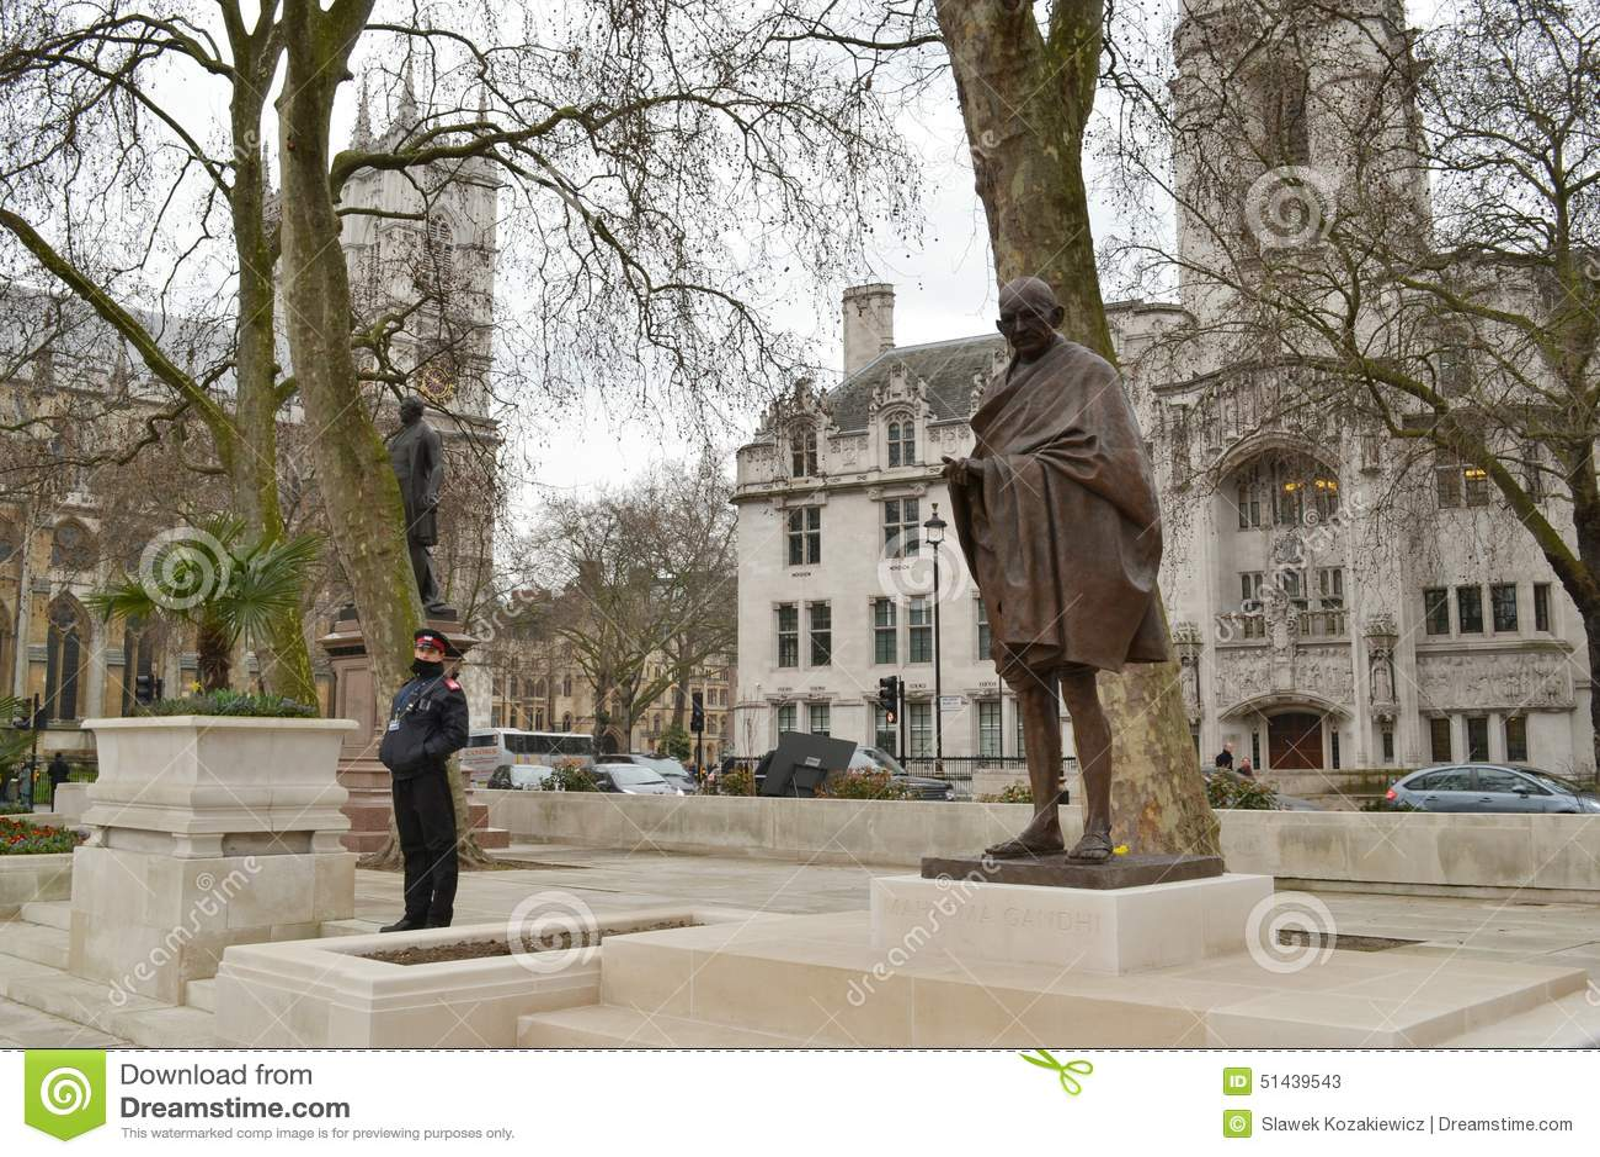 Парламент Махатма Ганди статуи придает квадратную форму Лондону